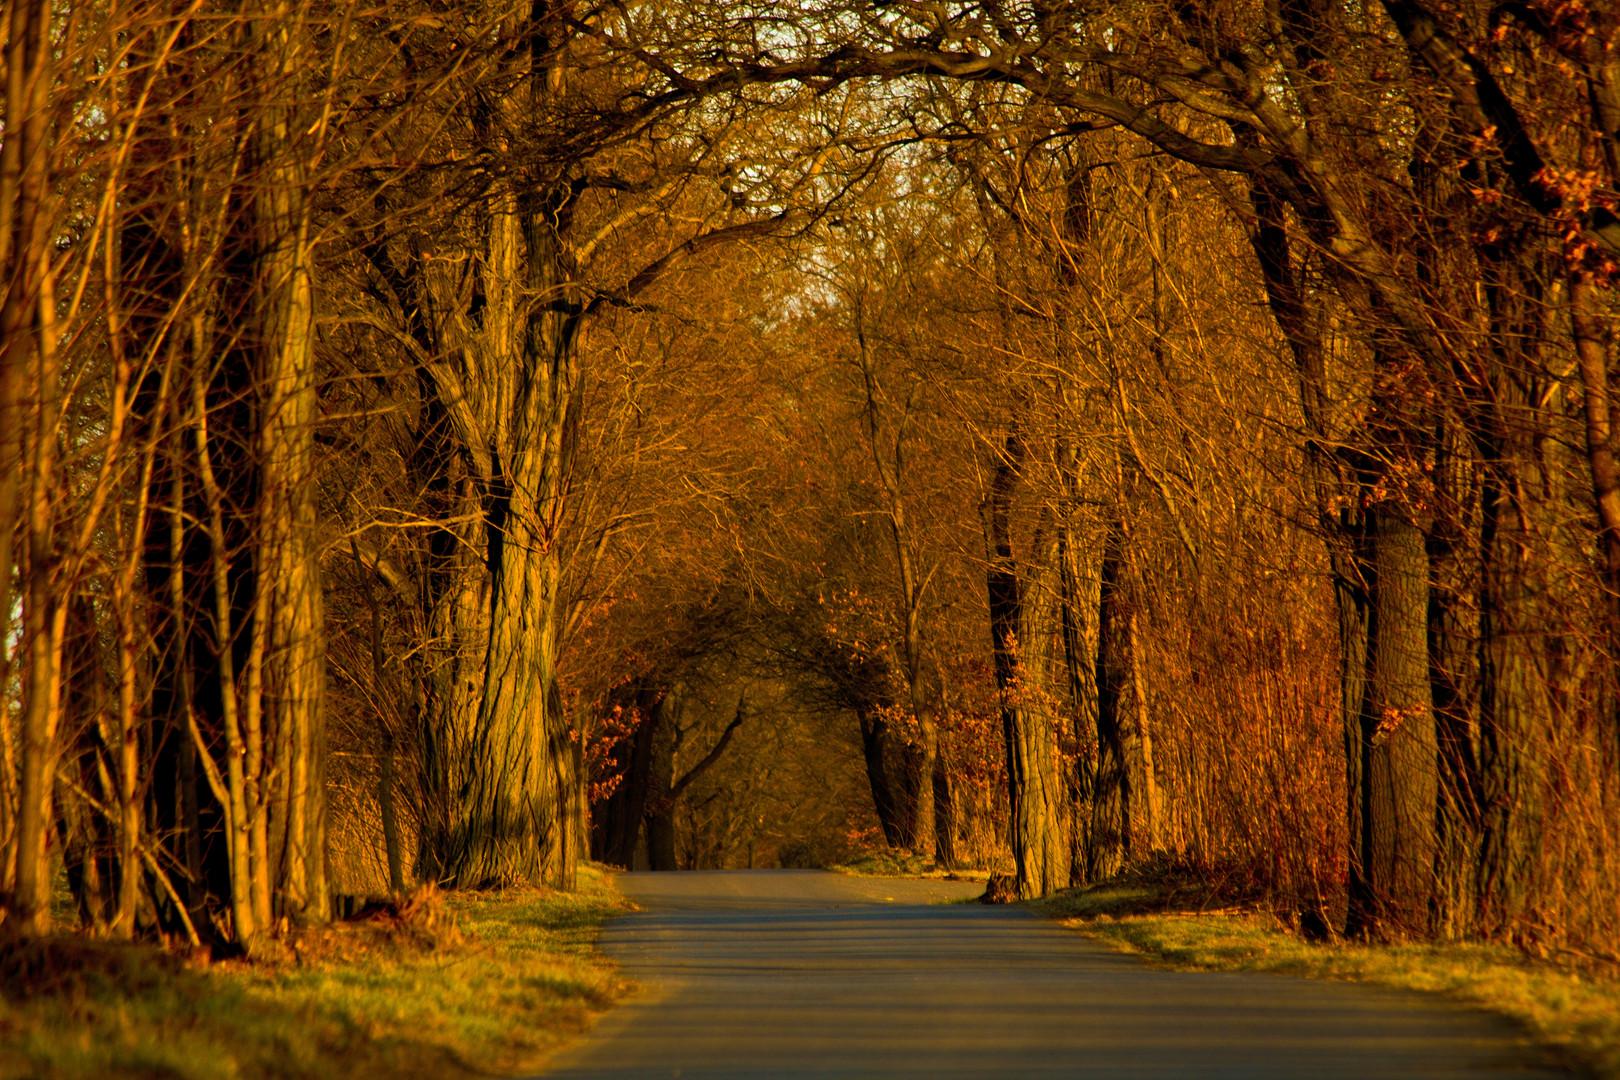 Take the long way ....